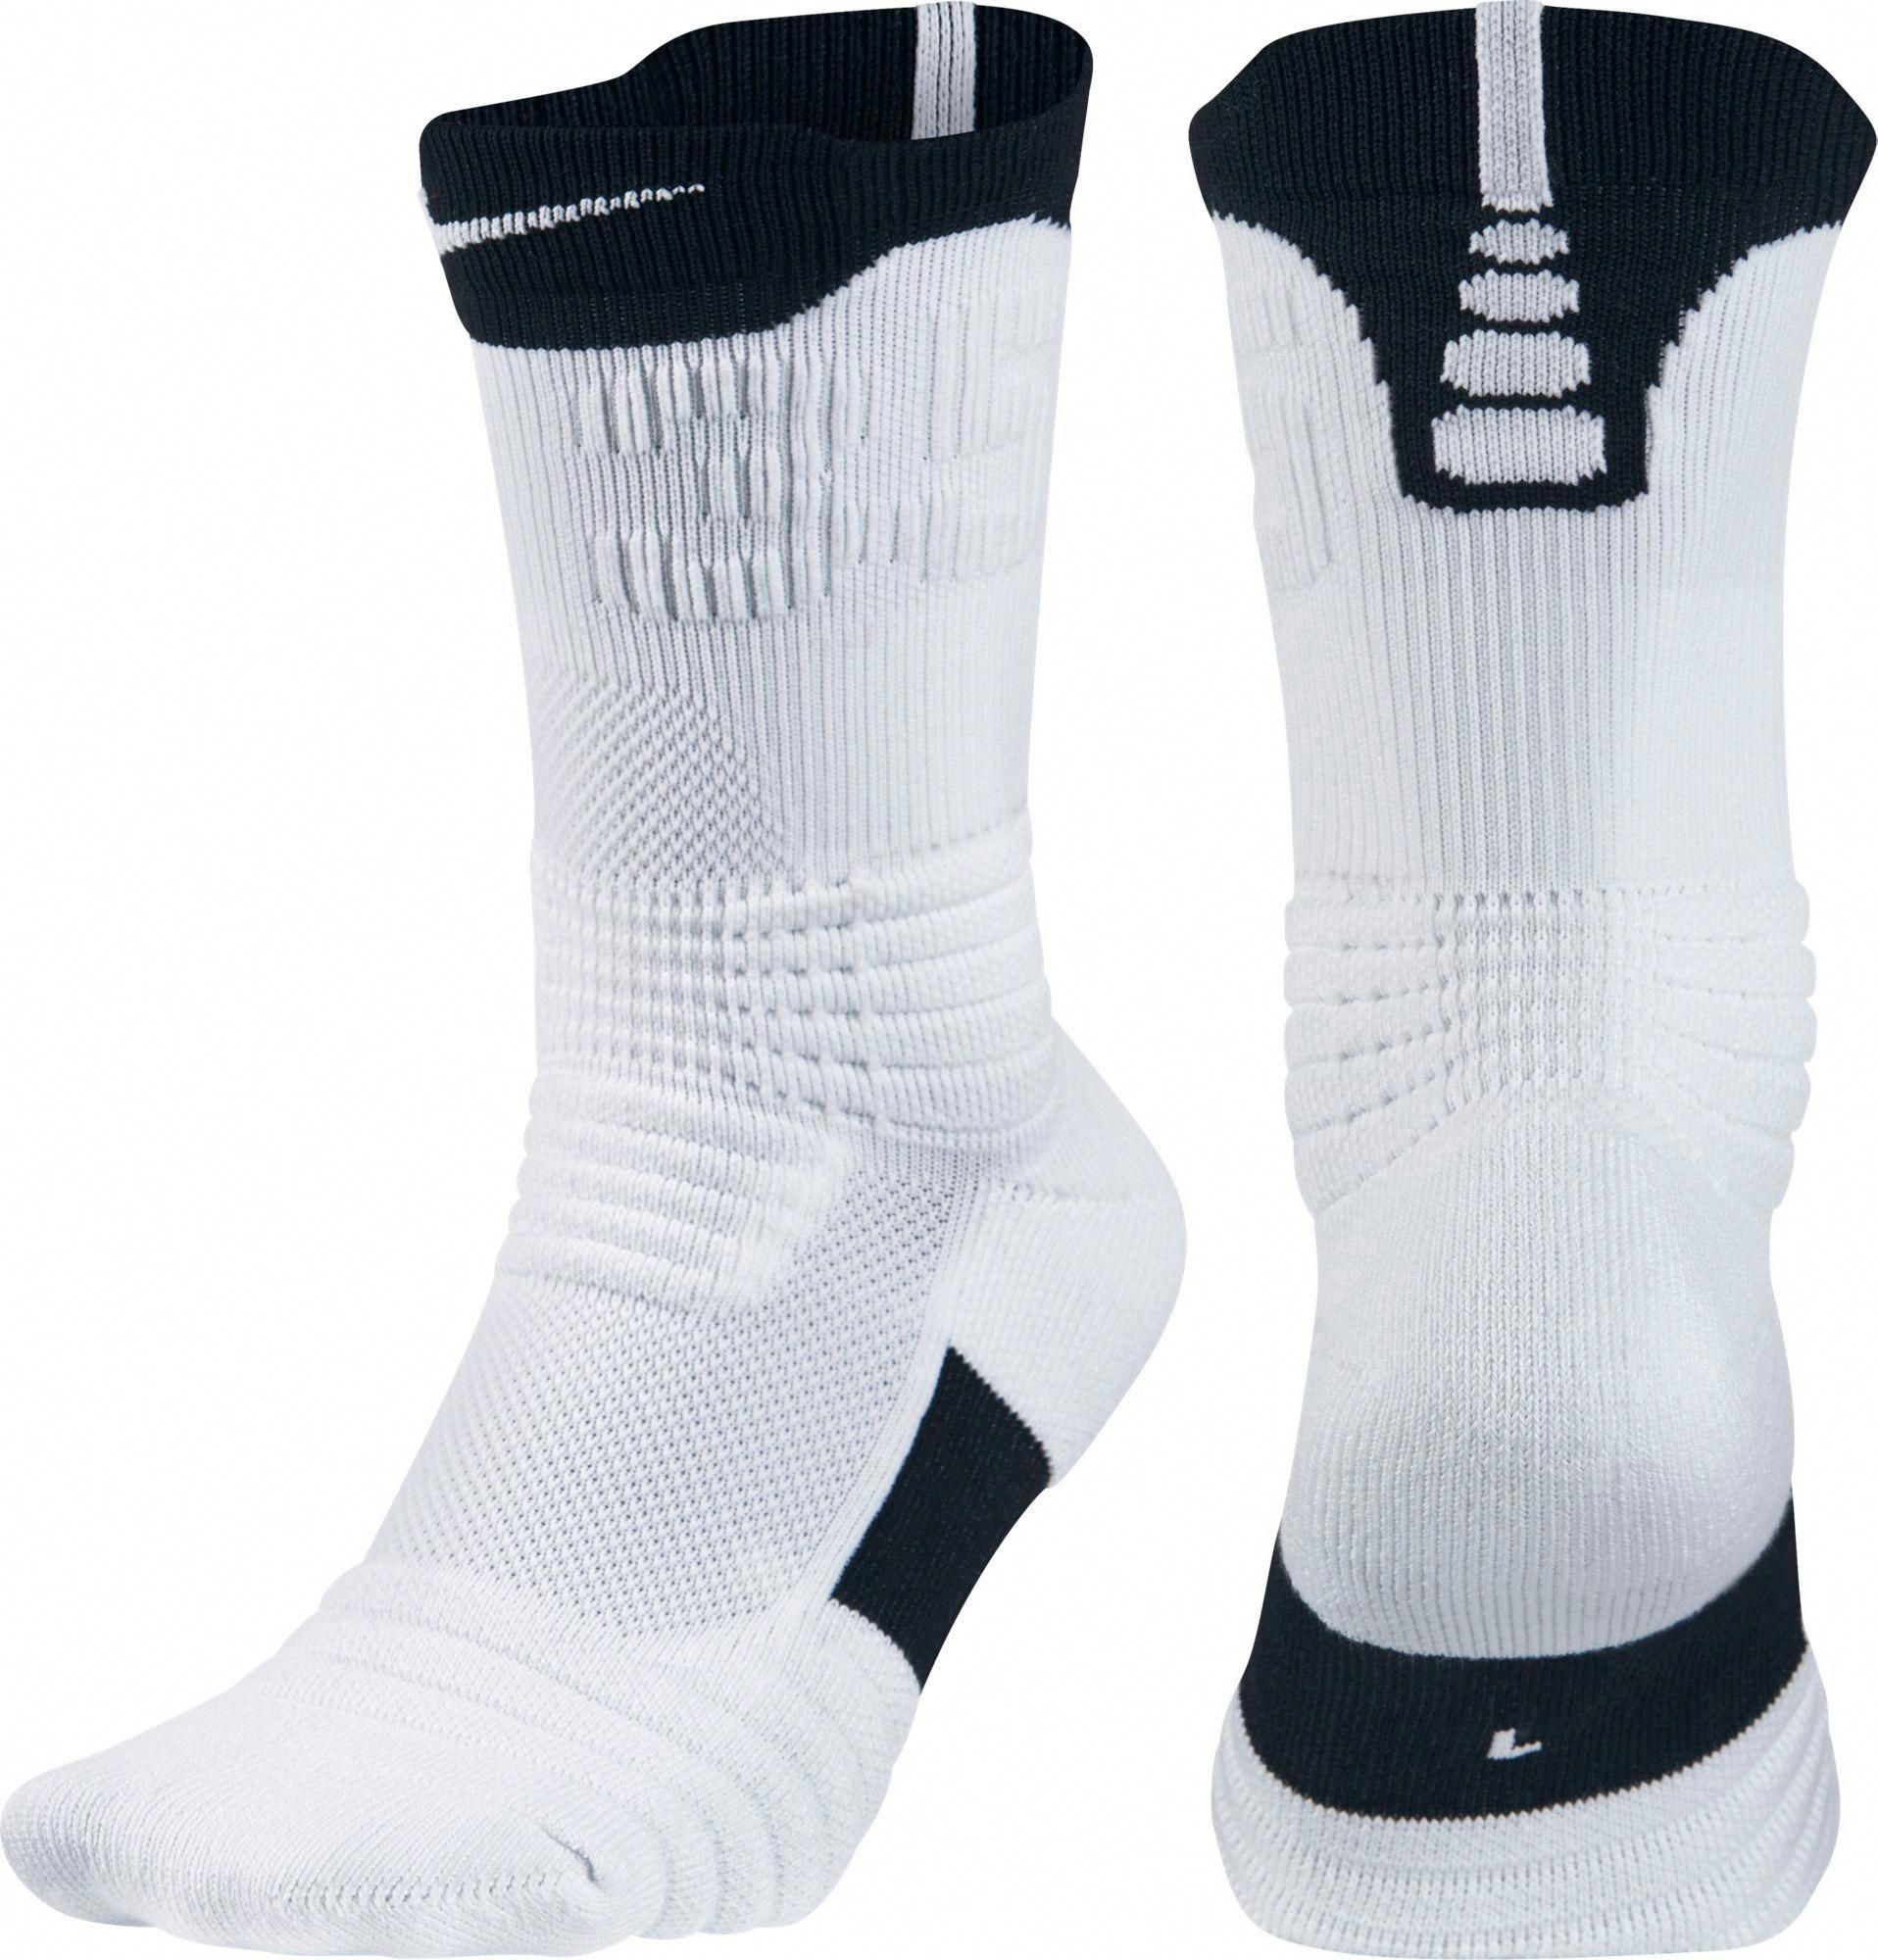 Basketball Knee Injury Basketball9yearold Basketballsocks 2020 Basketball Knee Basketball Socks Wsu Basketball